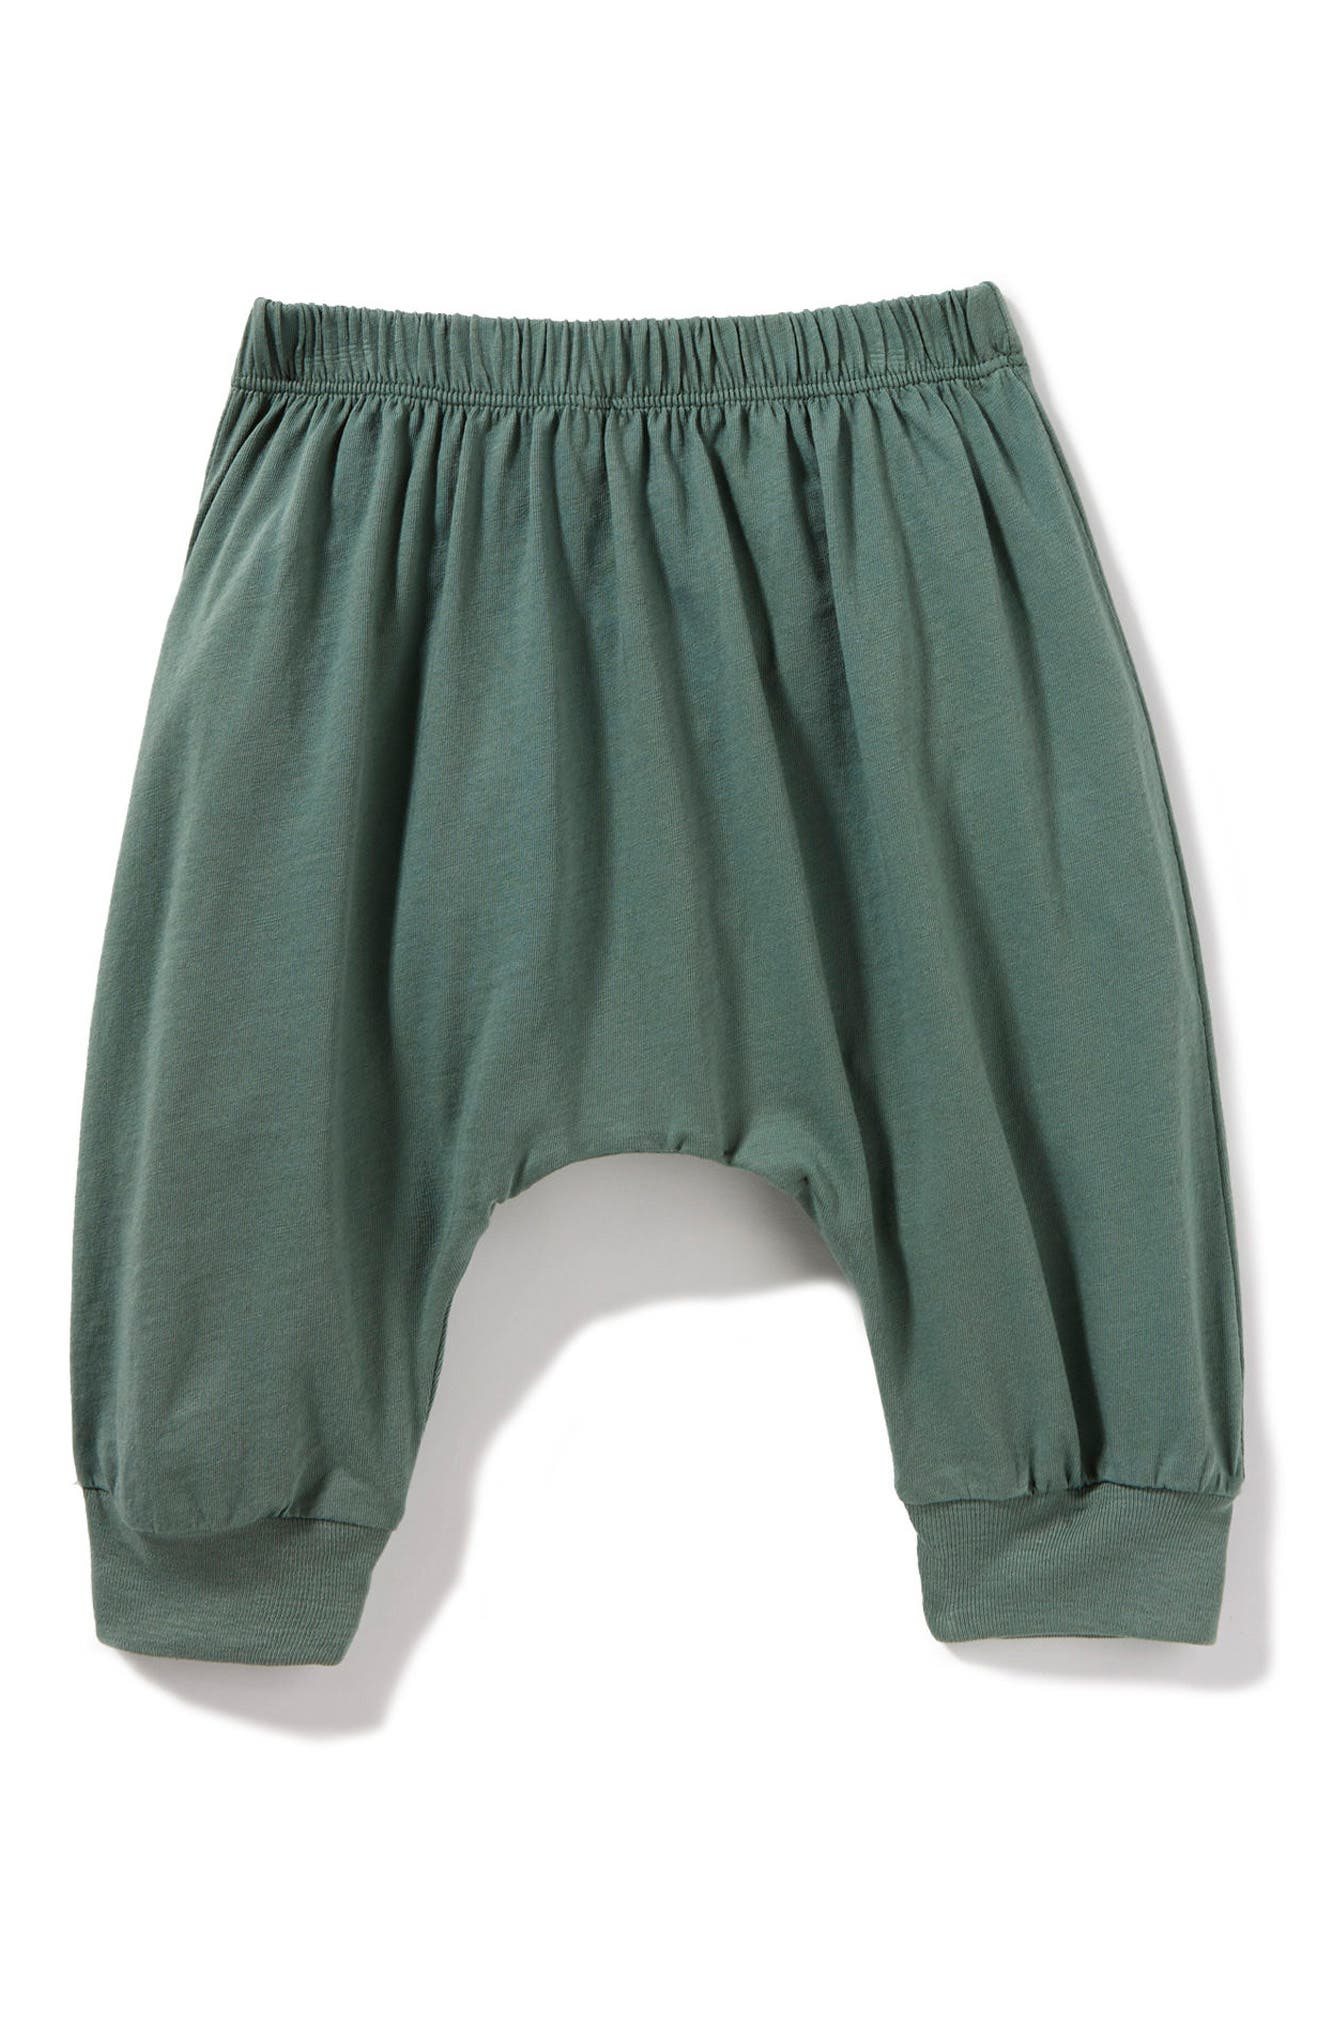 Peek Little Peanut Happy Pants,                         Main,                         color, 314